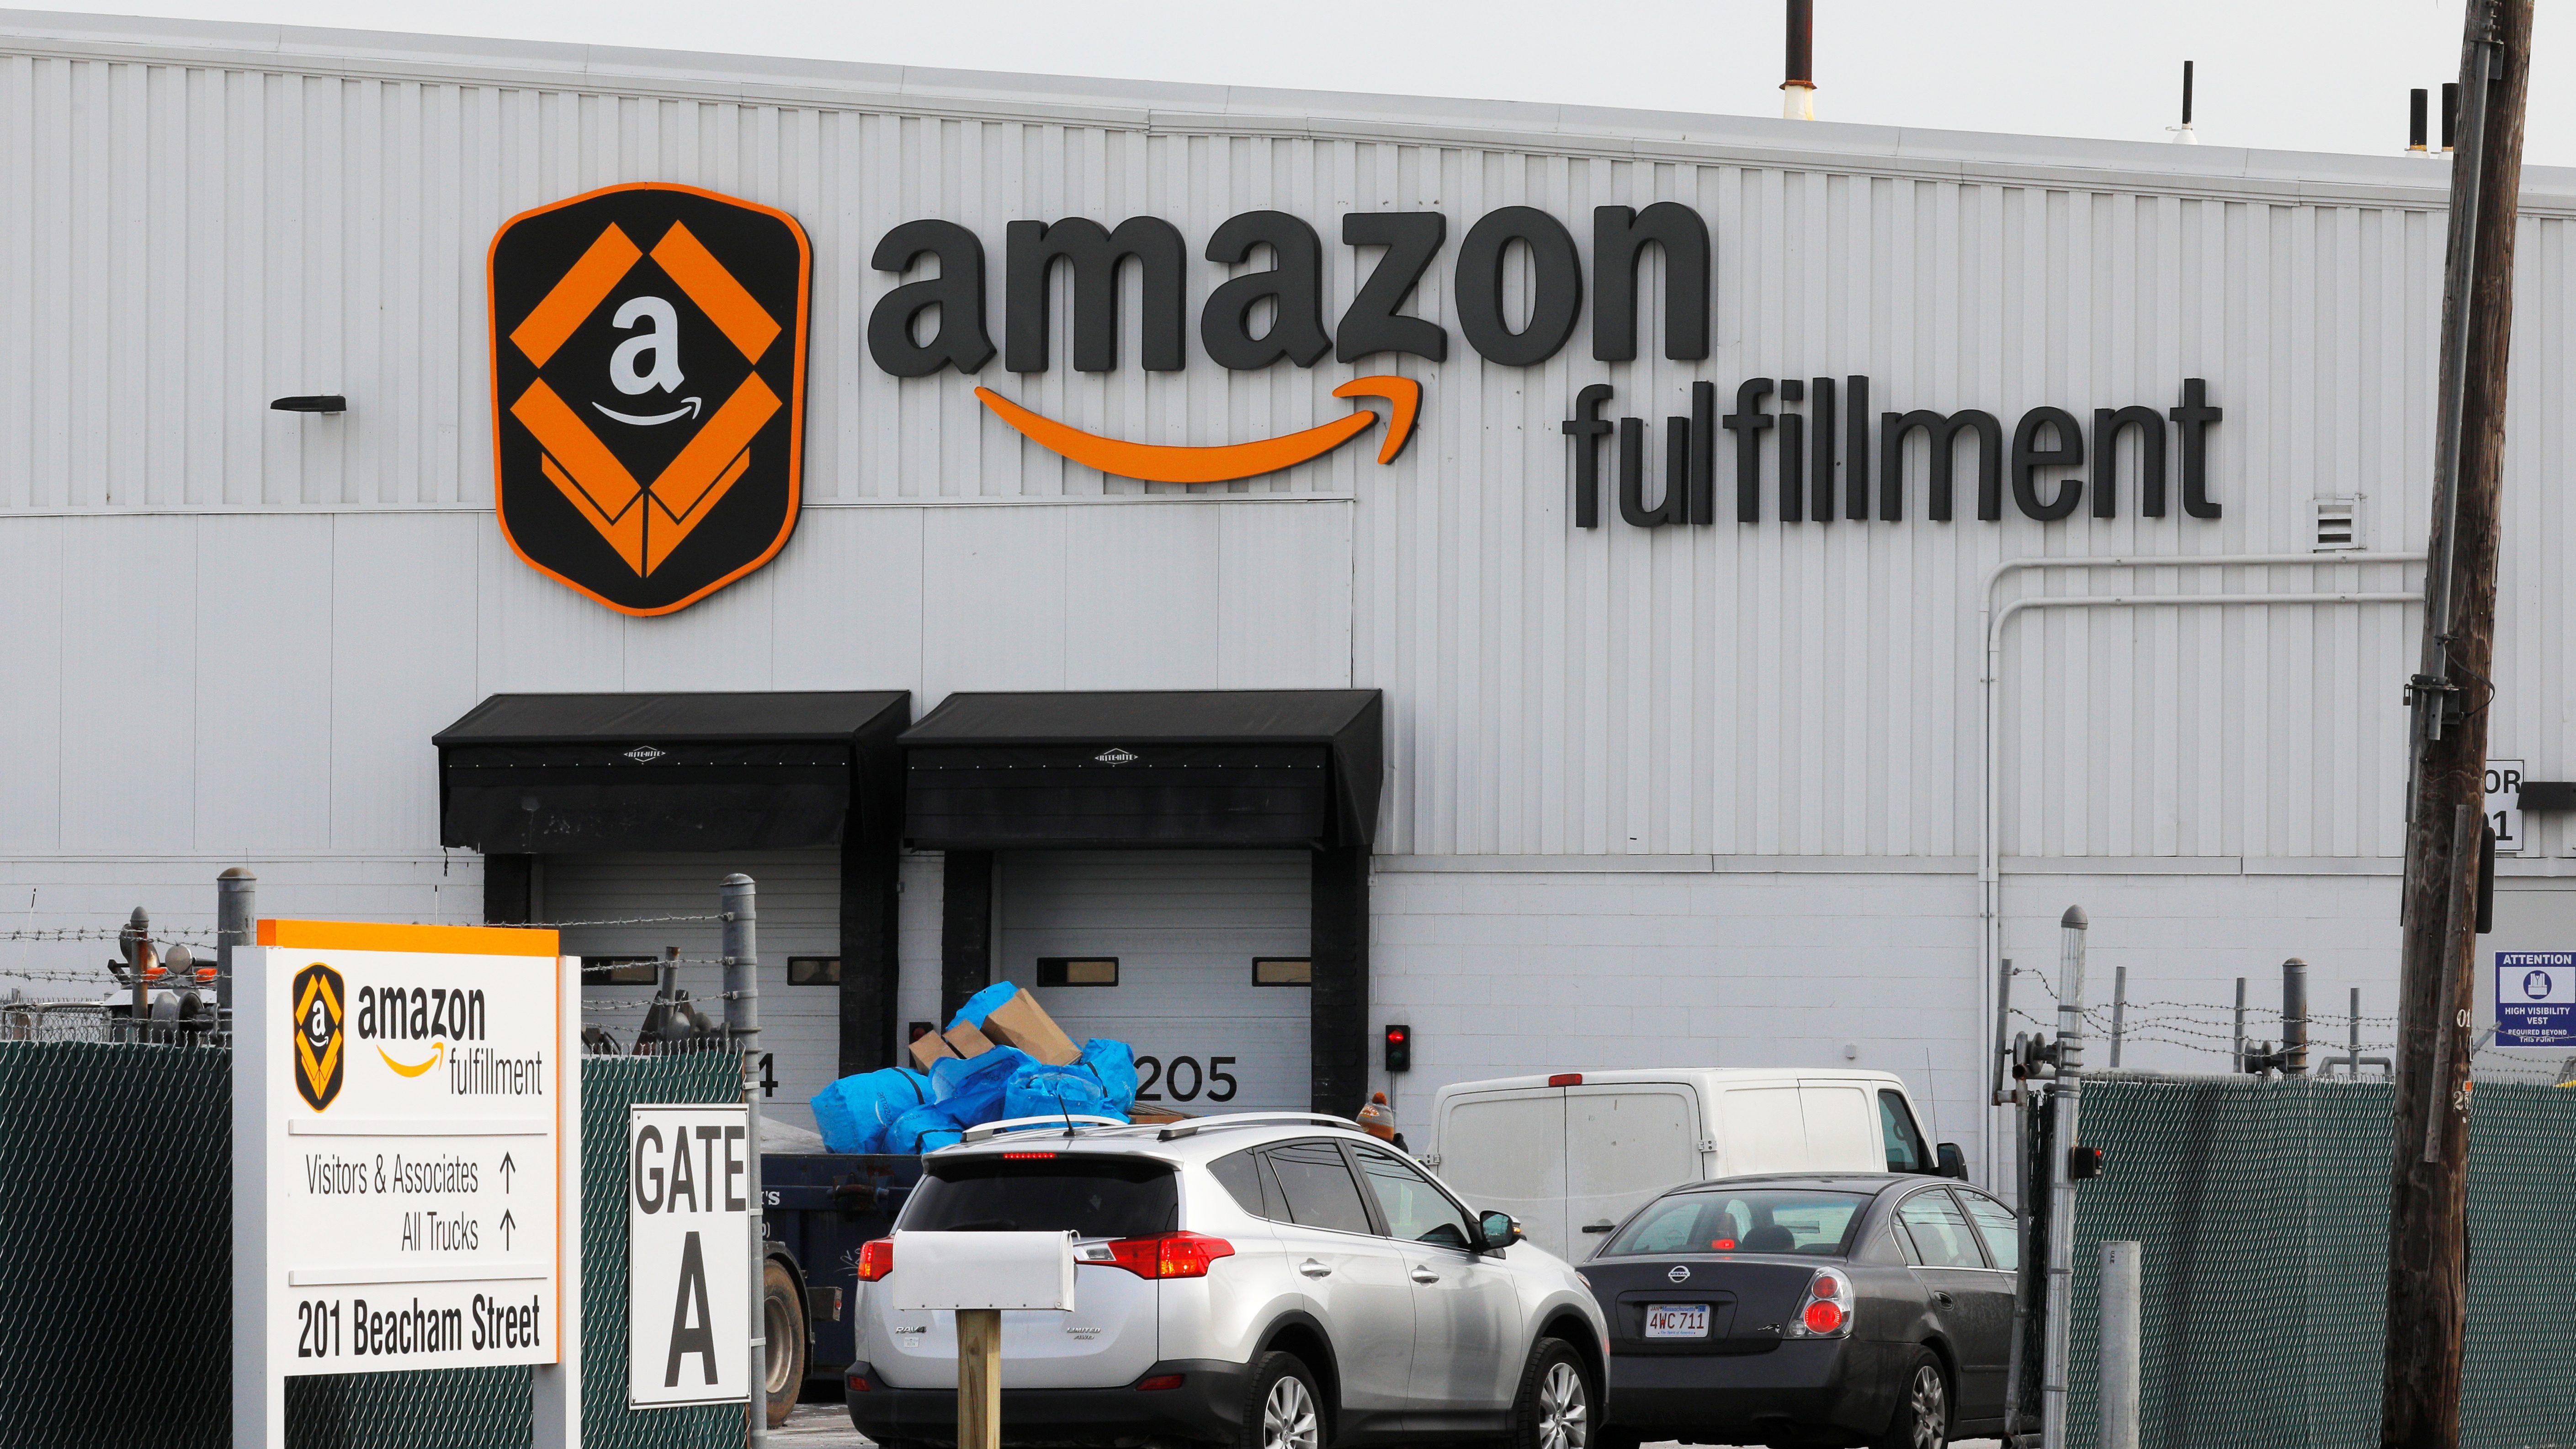 Signs mark the Amazon Fulfillment facility in Everett, Massachusetts, U.S., February 1, 2018.   REUTERS/Brian Snyder - RC1627BD1E90